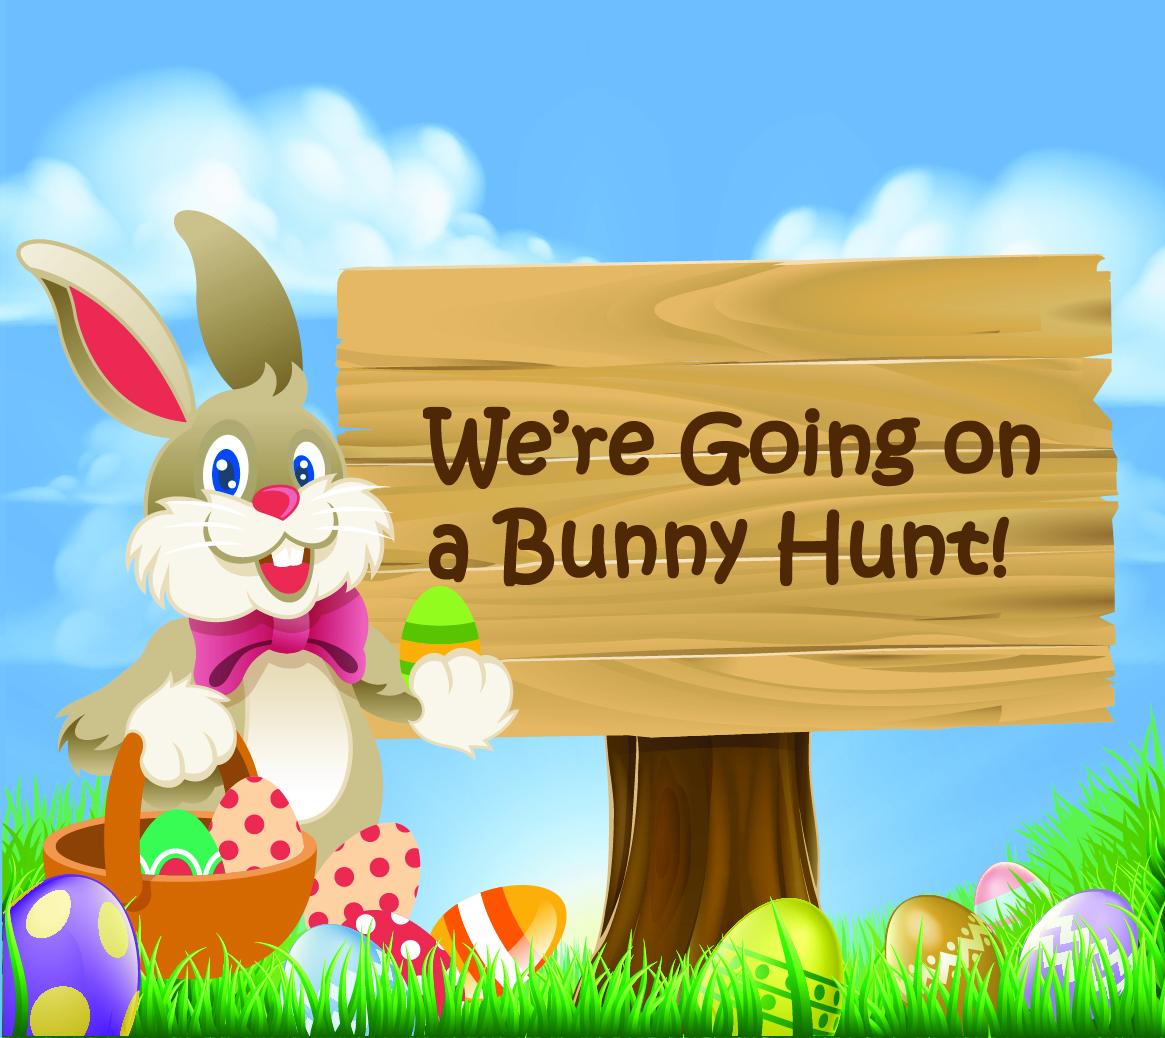 Easter Bunny Hunt thumbnail image.